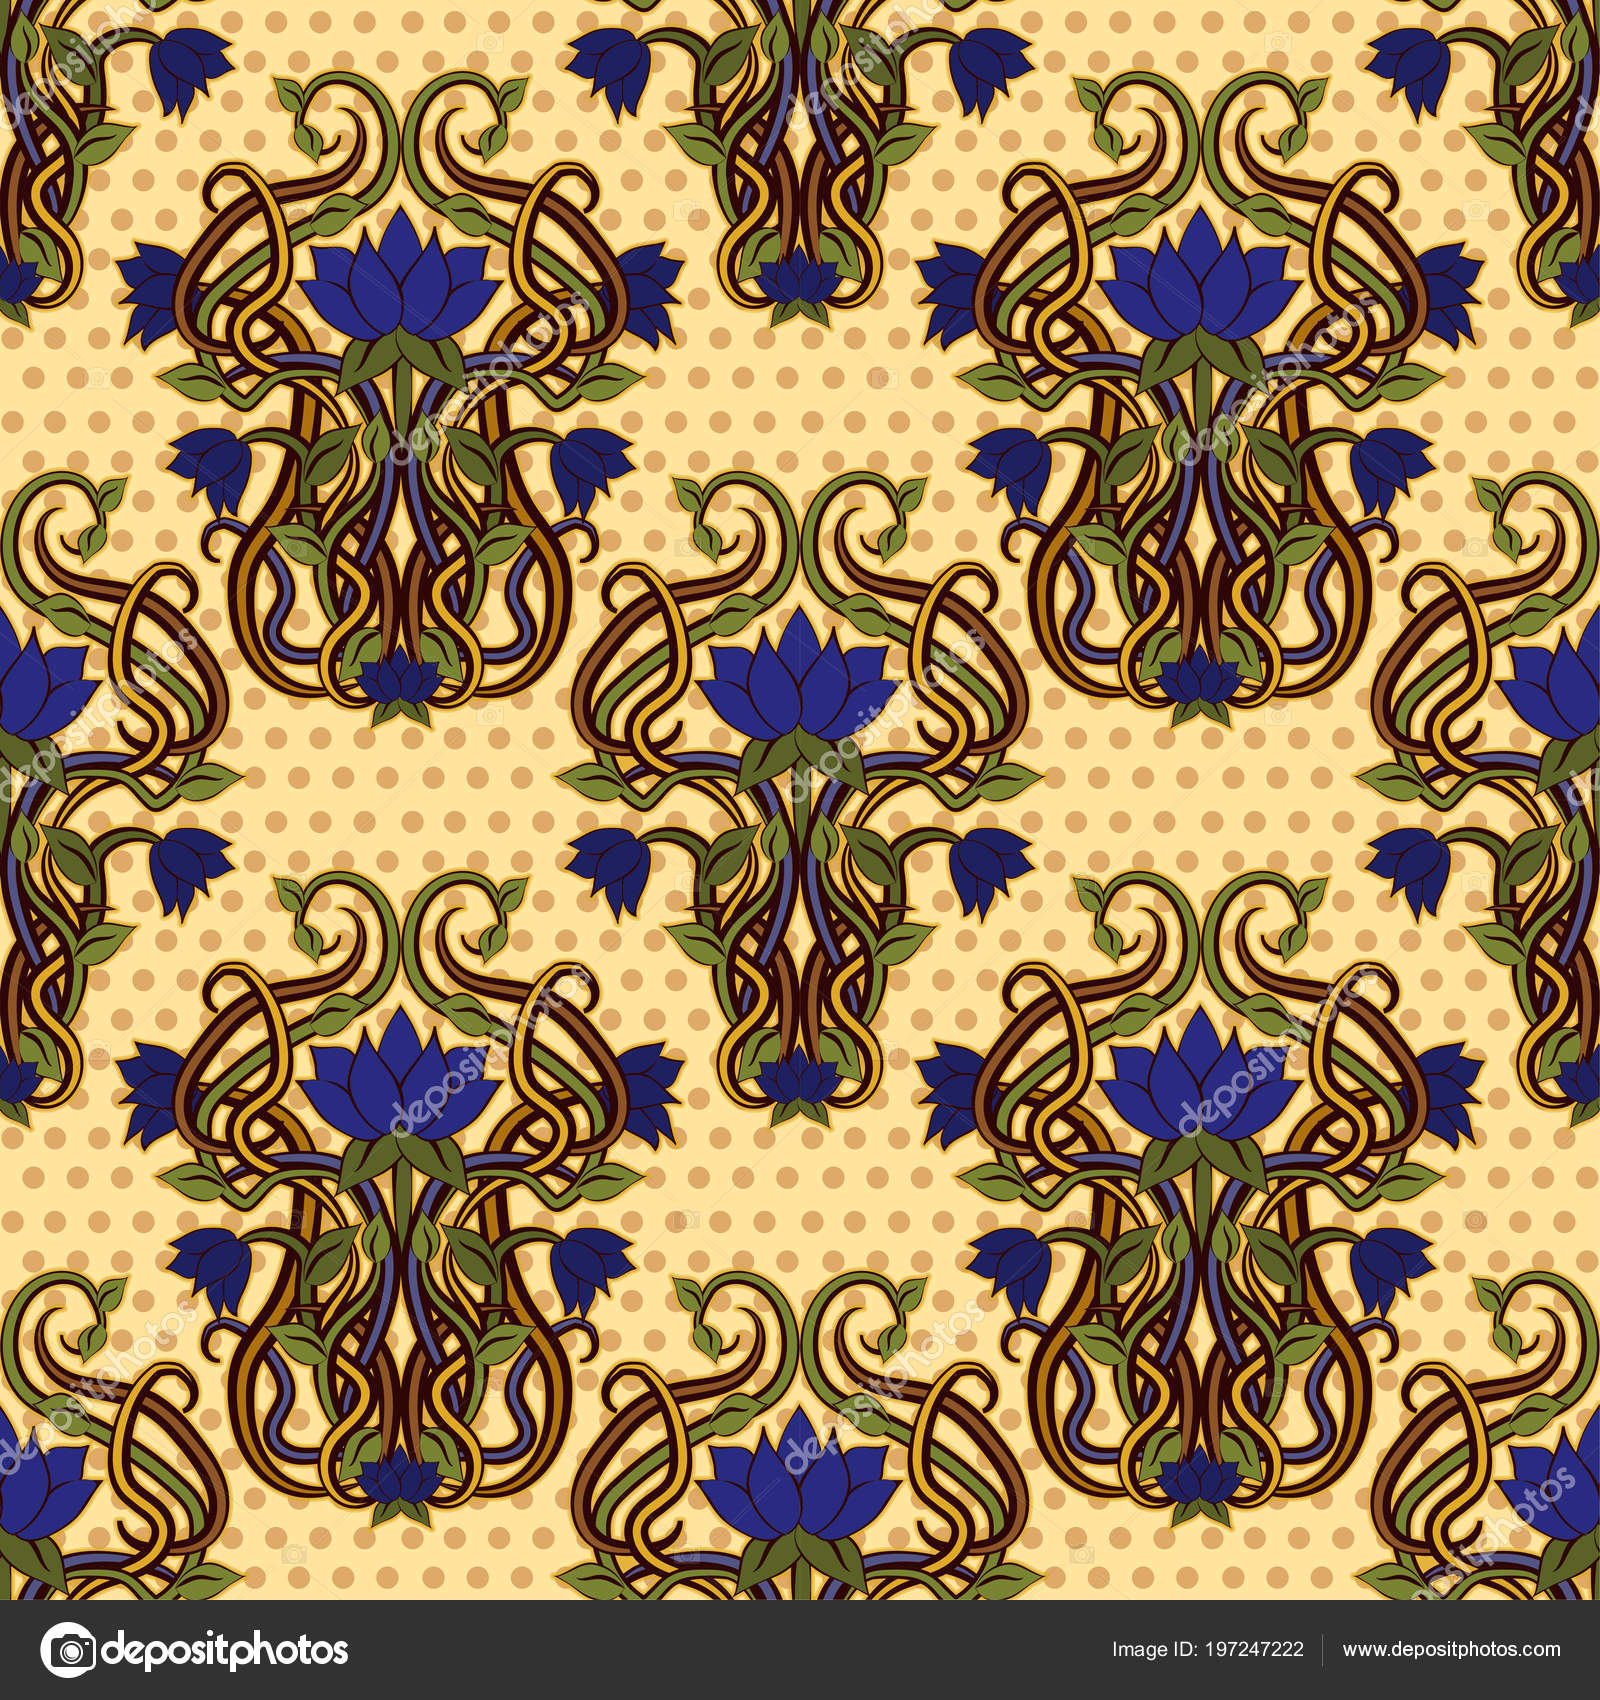 Seamless Floral Wallpaper Art Nouveau Style Vector Illustration